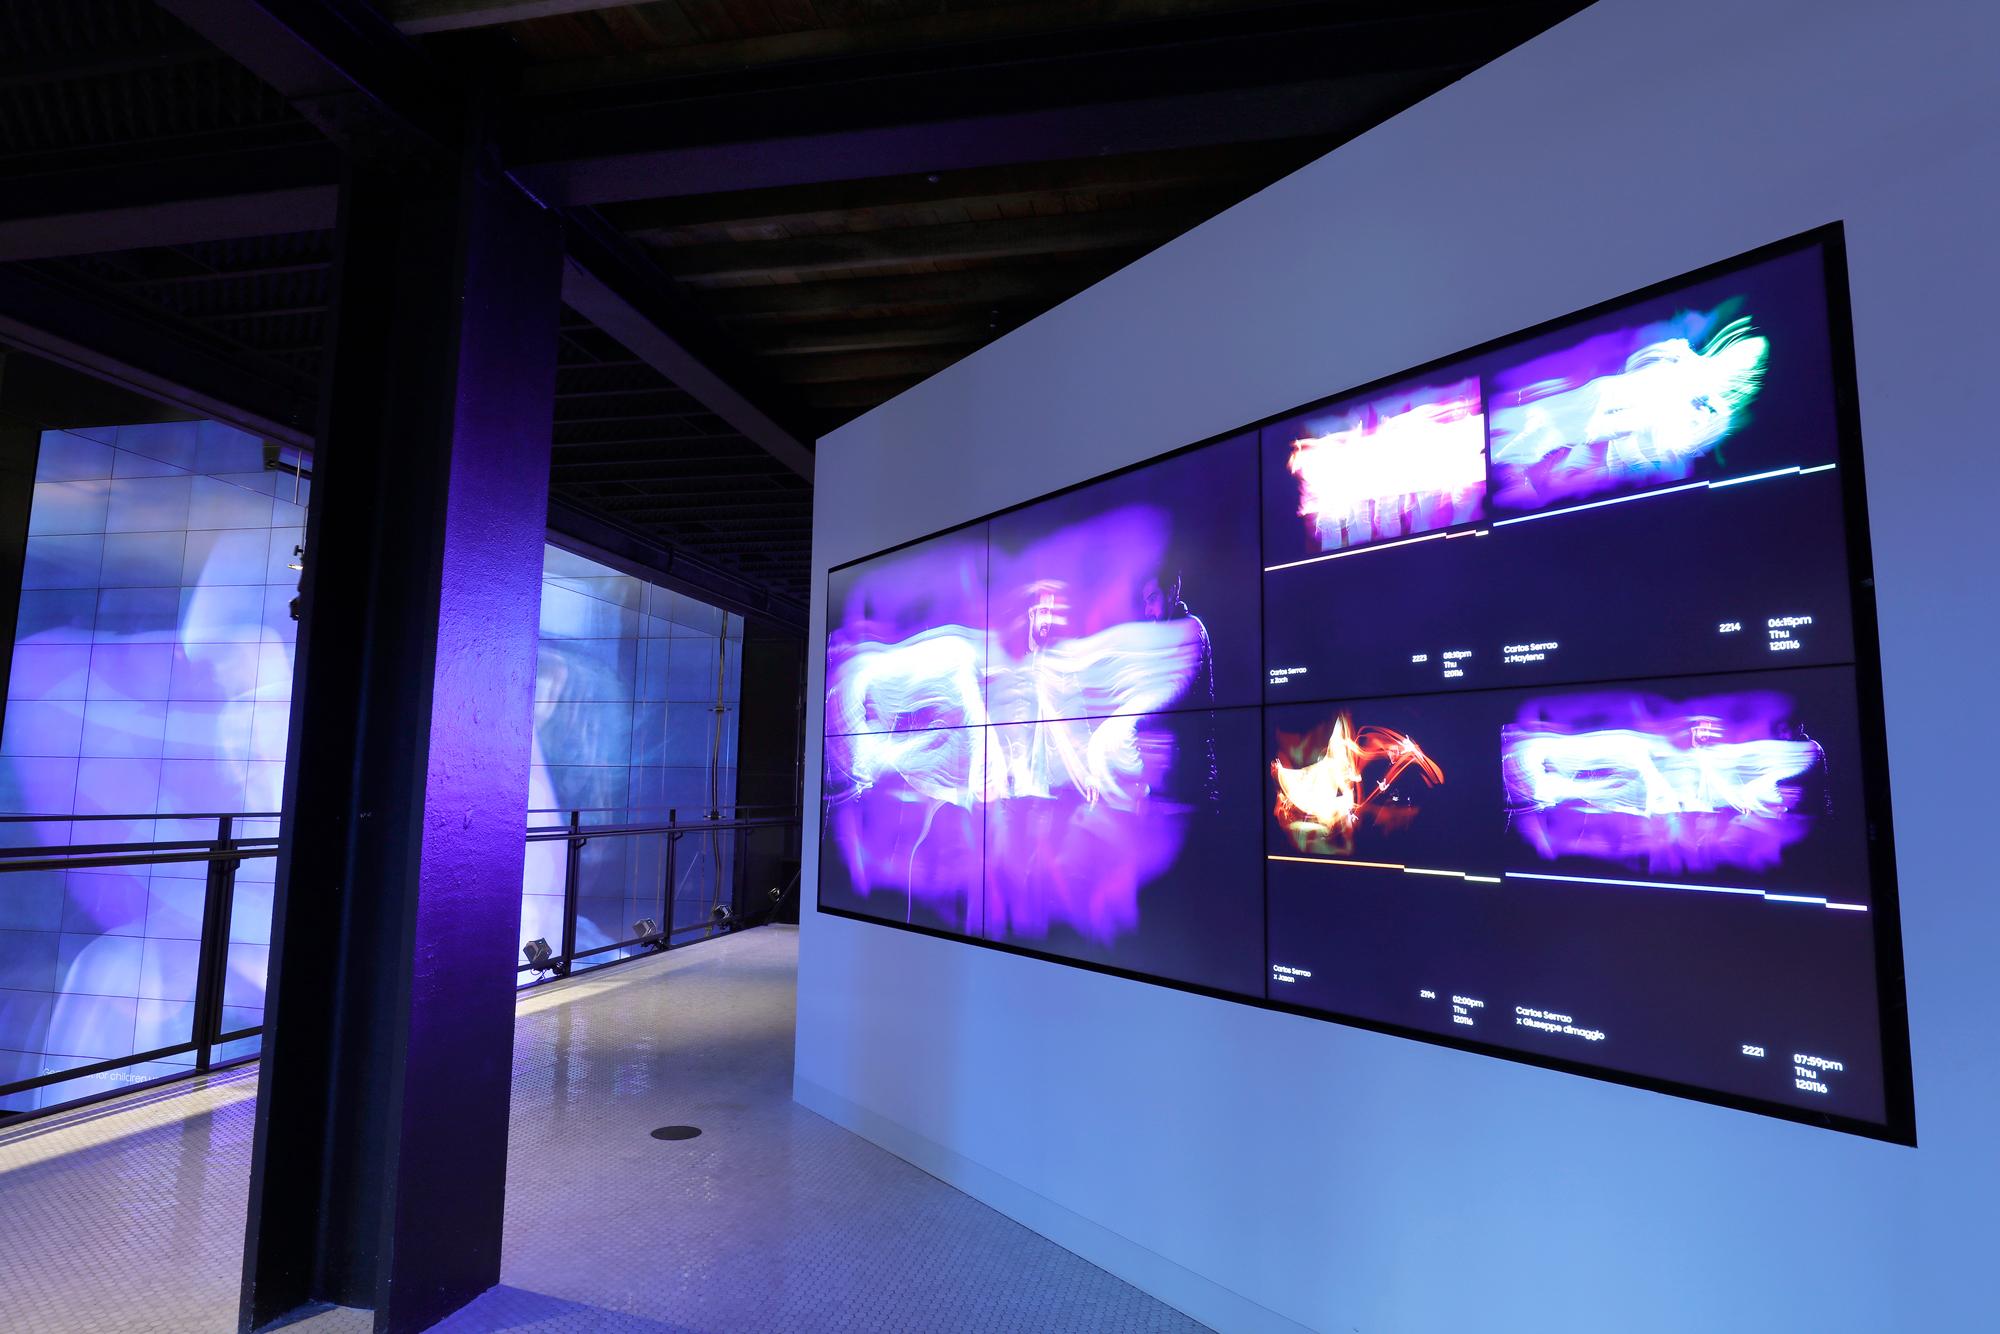 Samsung_837_04.jpg